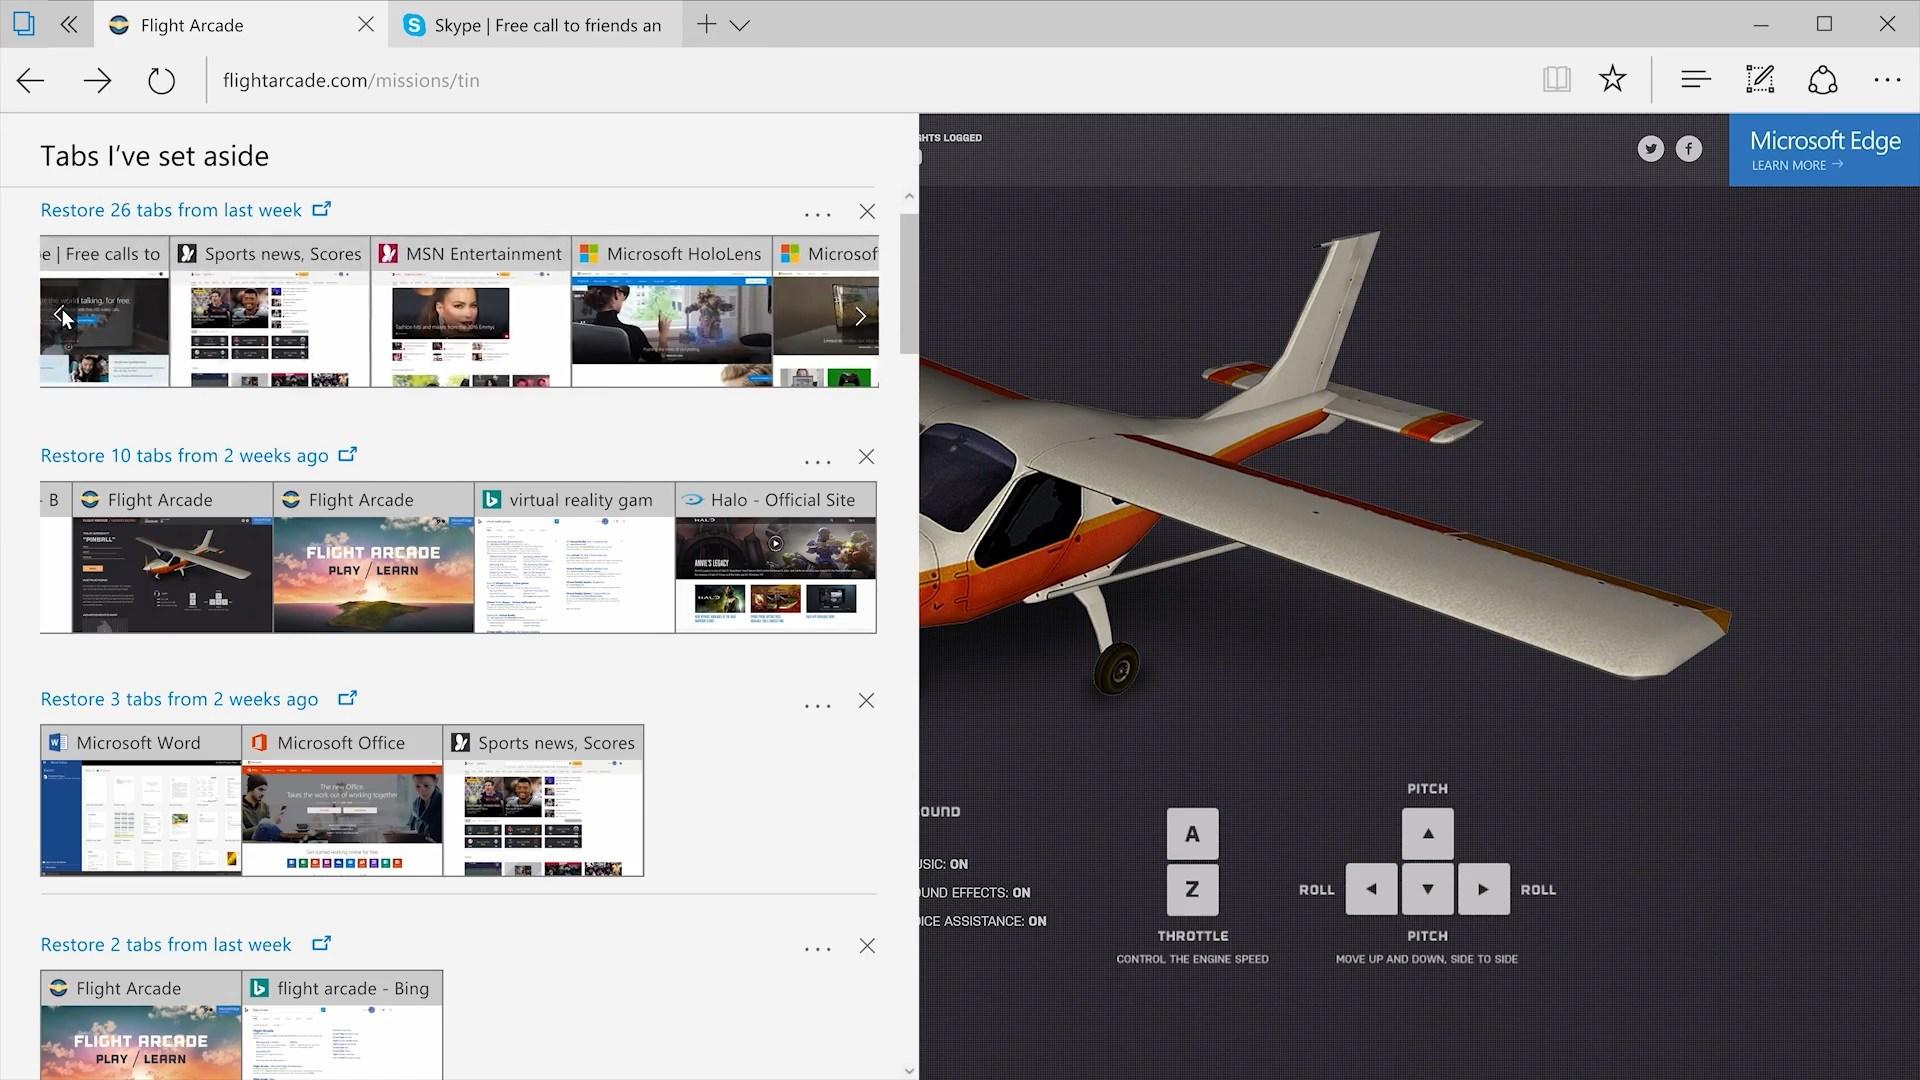 microsoft-edge-windows-10-creators-update